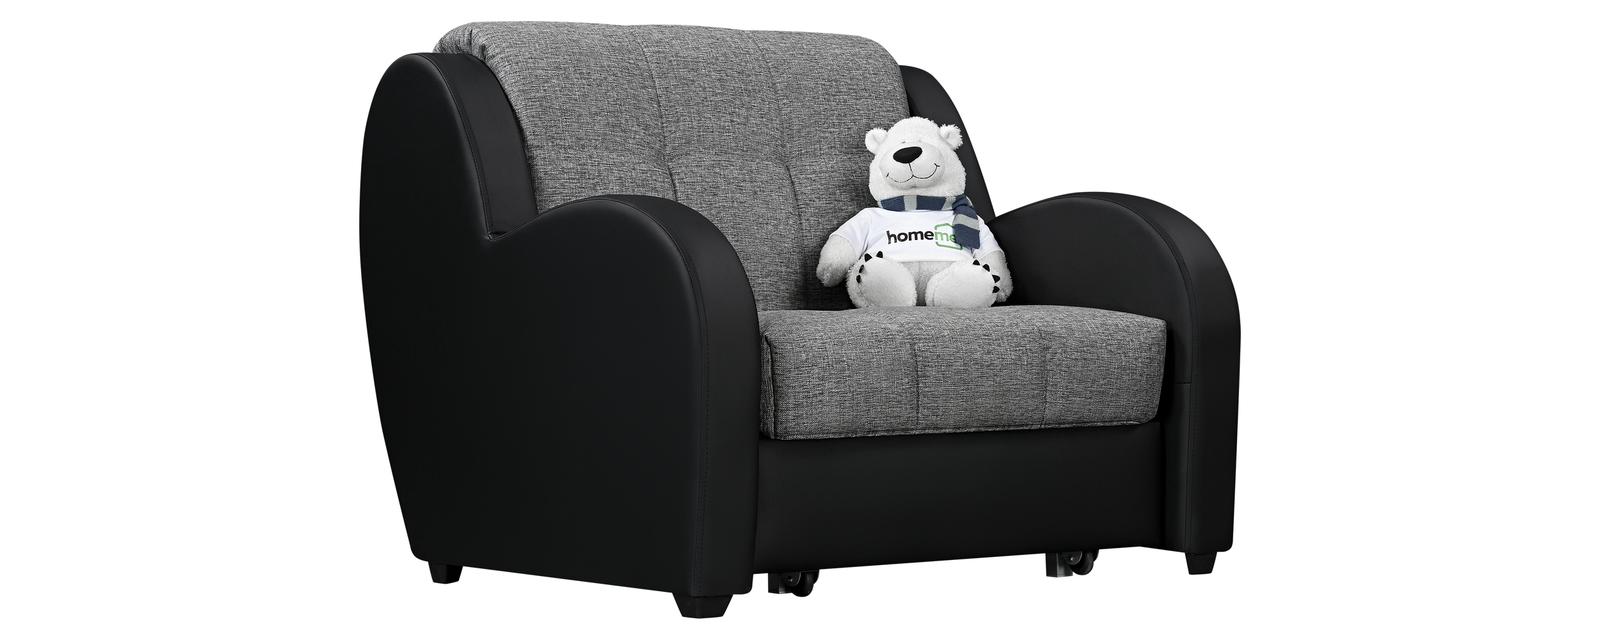 Кресло HomeMe Барон от Homeme.ru